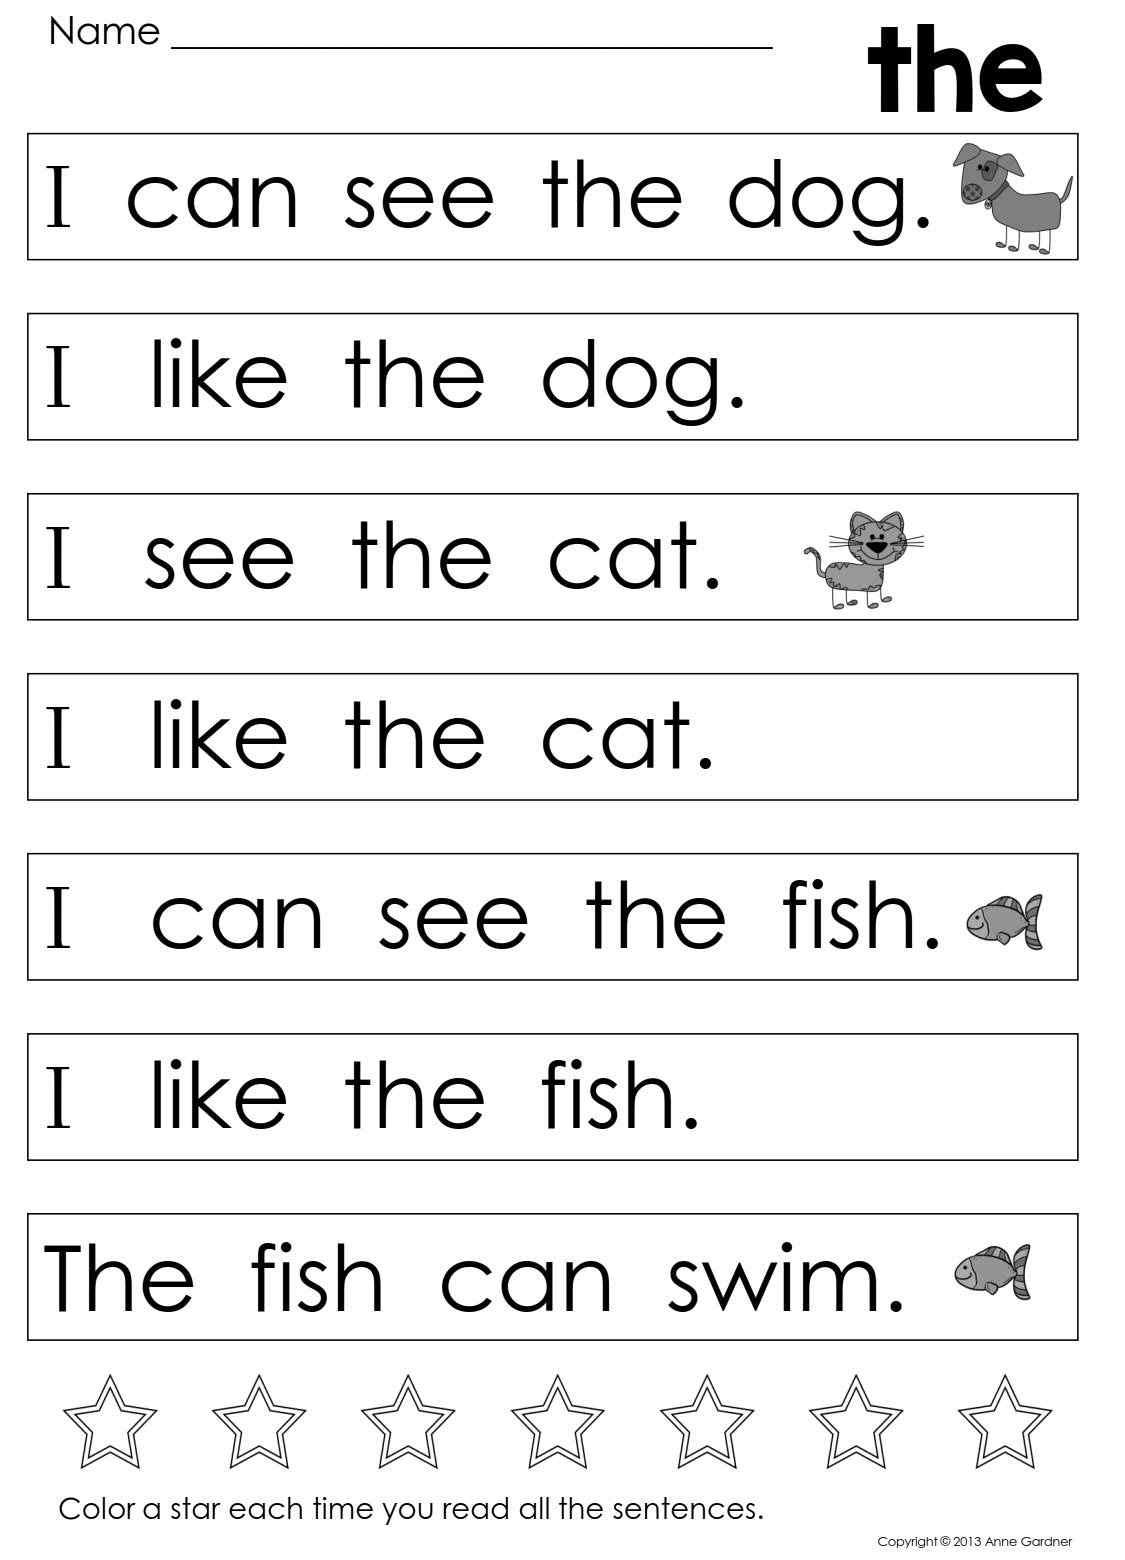 Educational Toys Children Learn English Homework Very